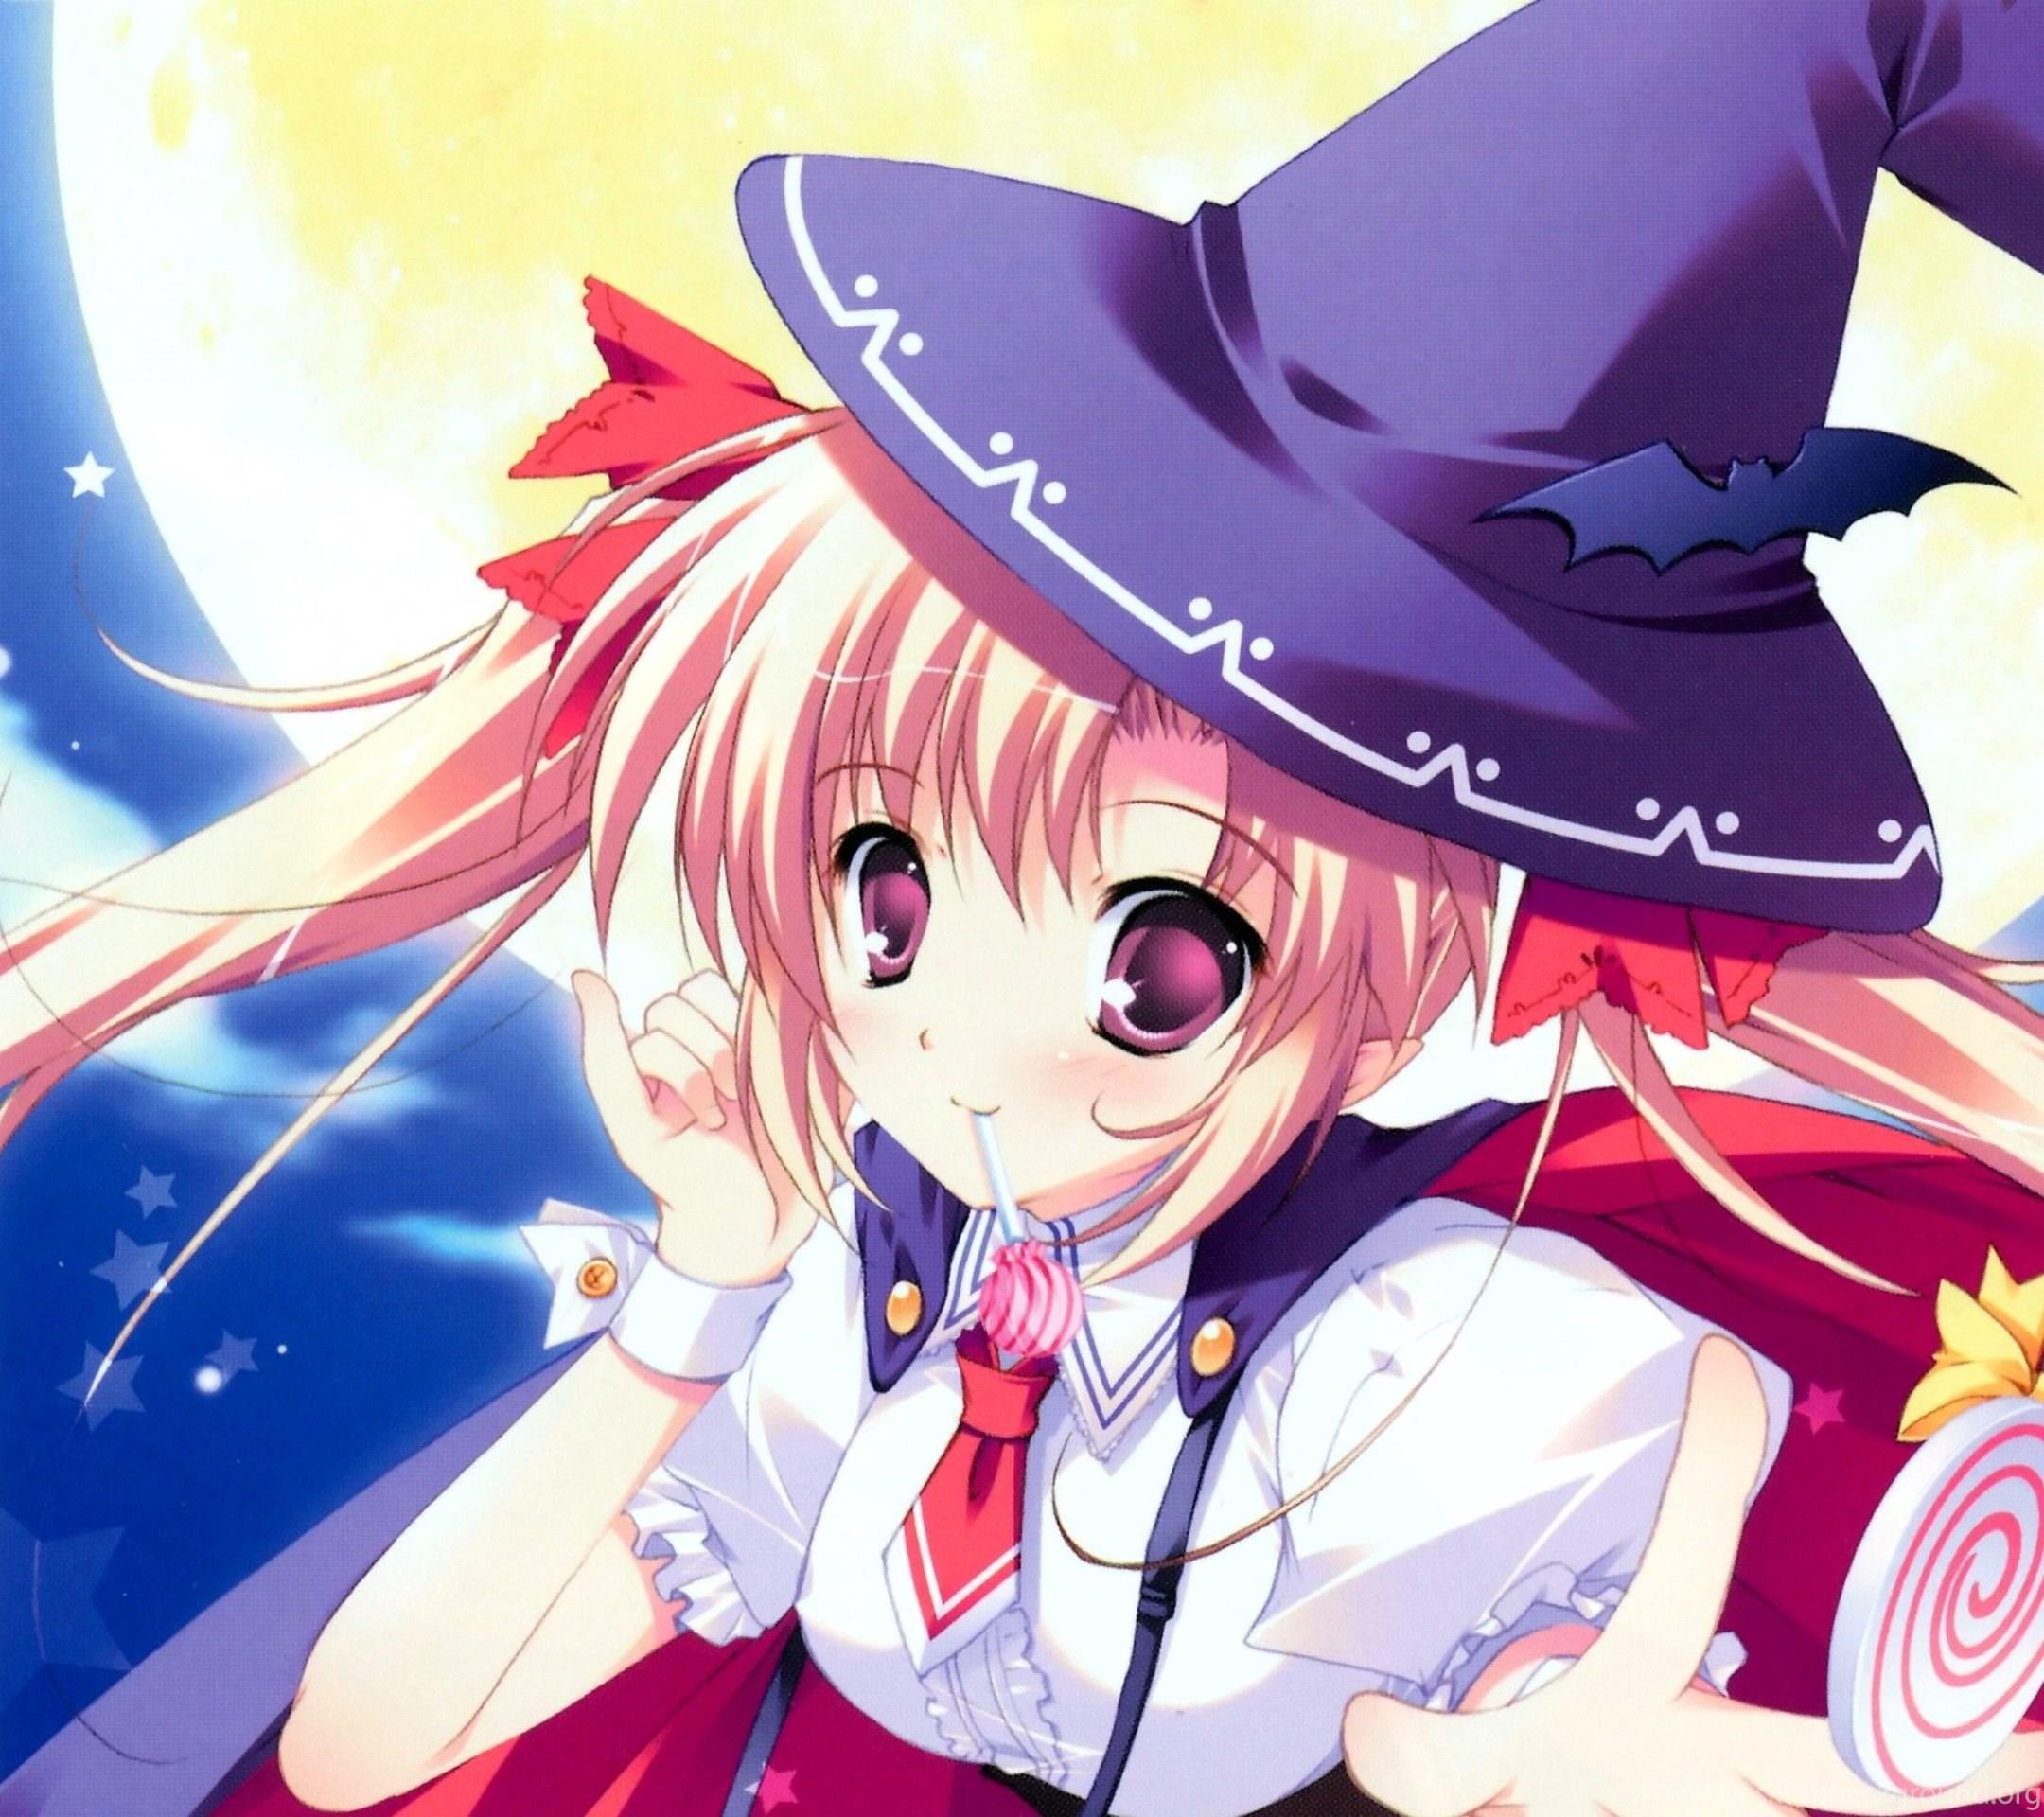 Anime Halloween 13 Android Wallpaper 2160x19 5 Jpg Desktop Background